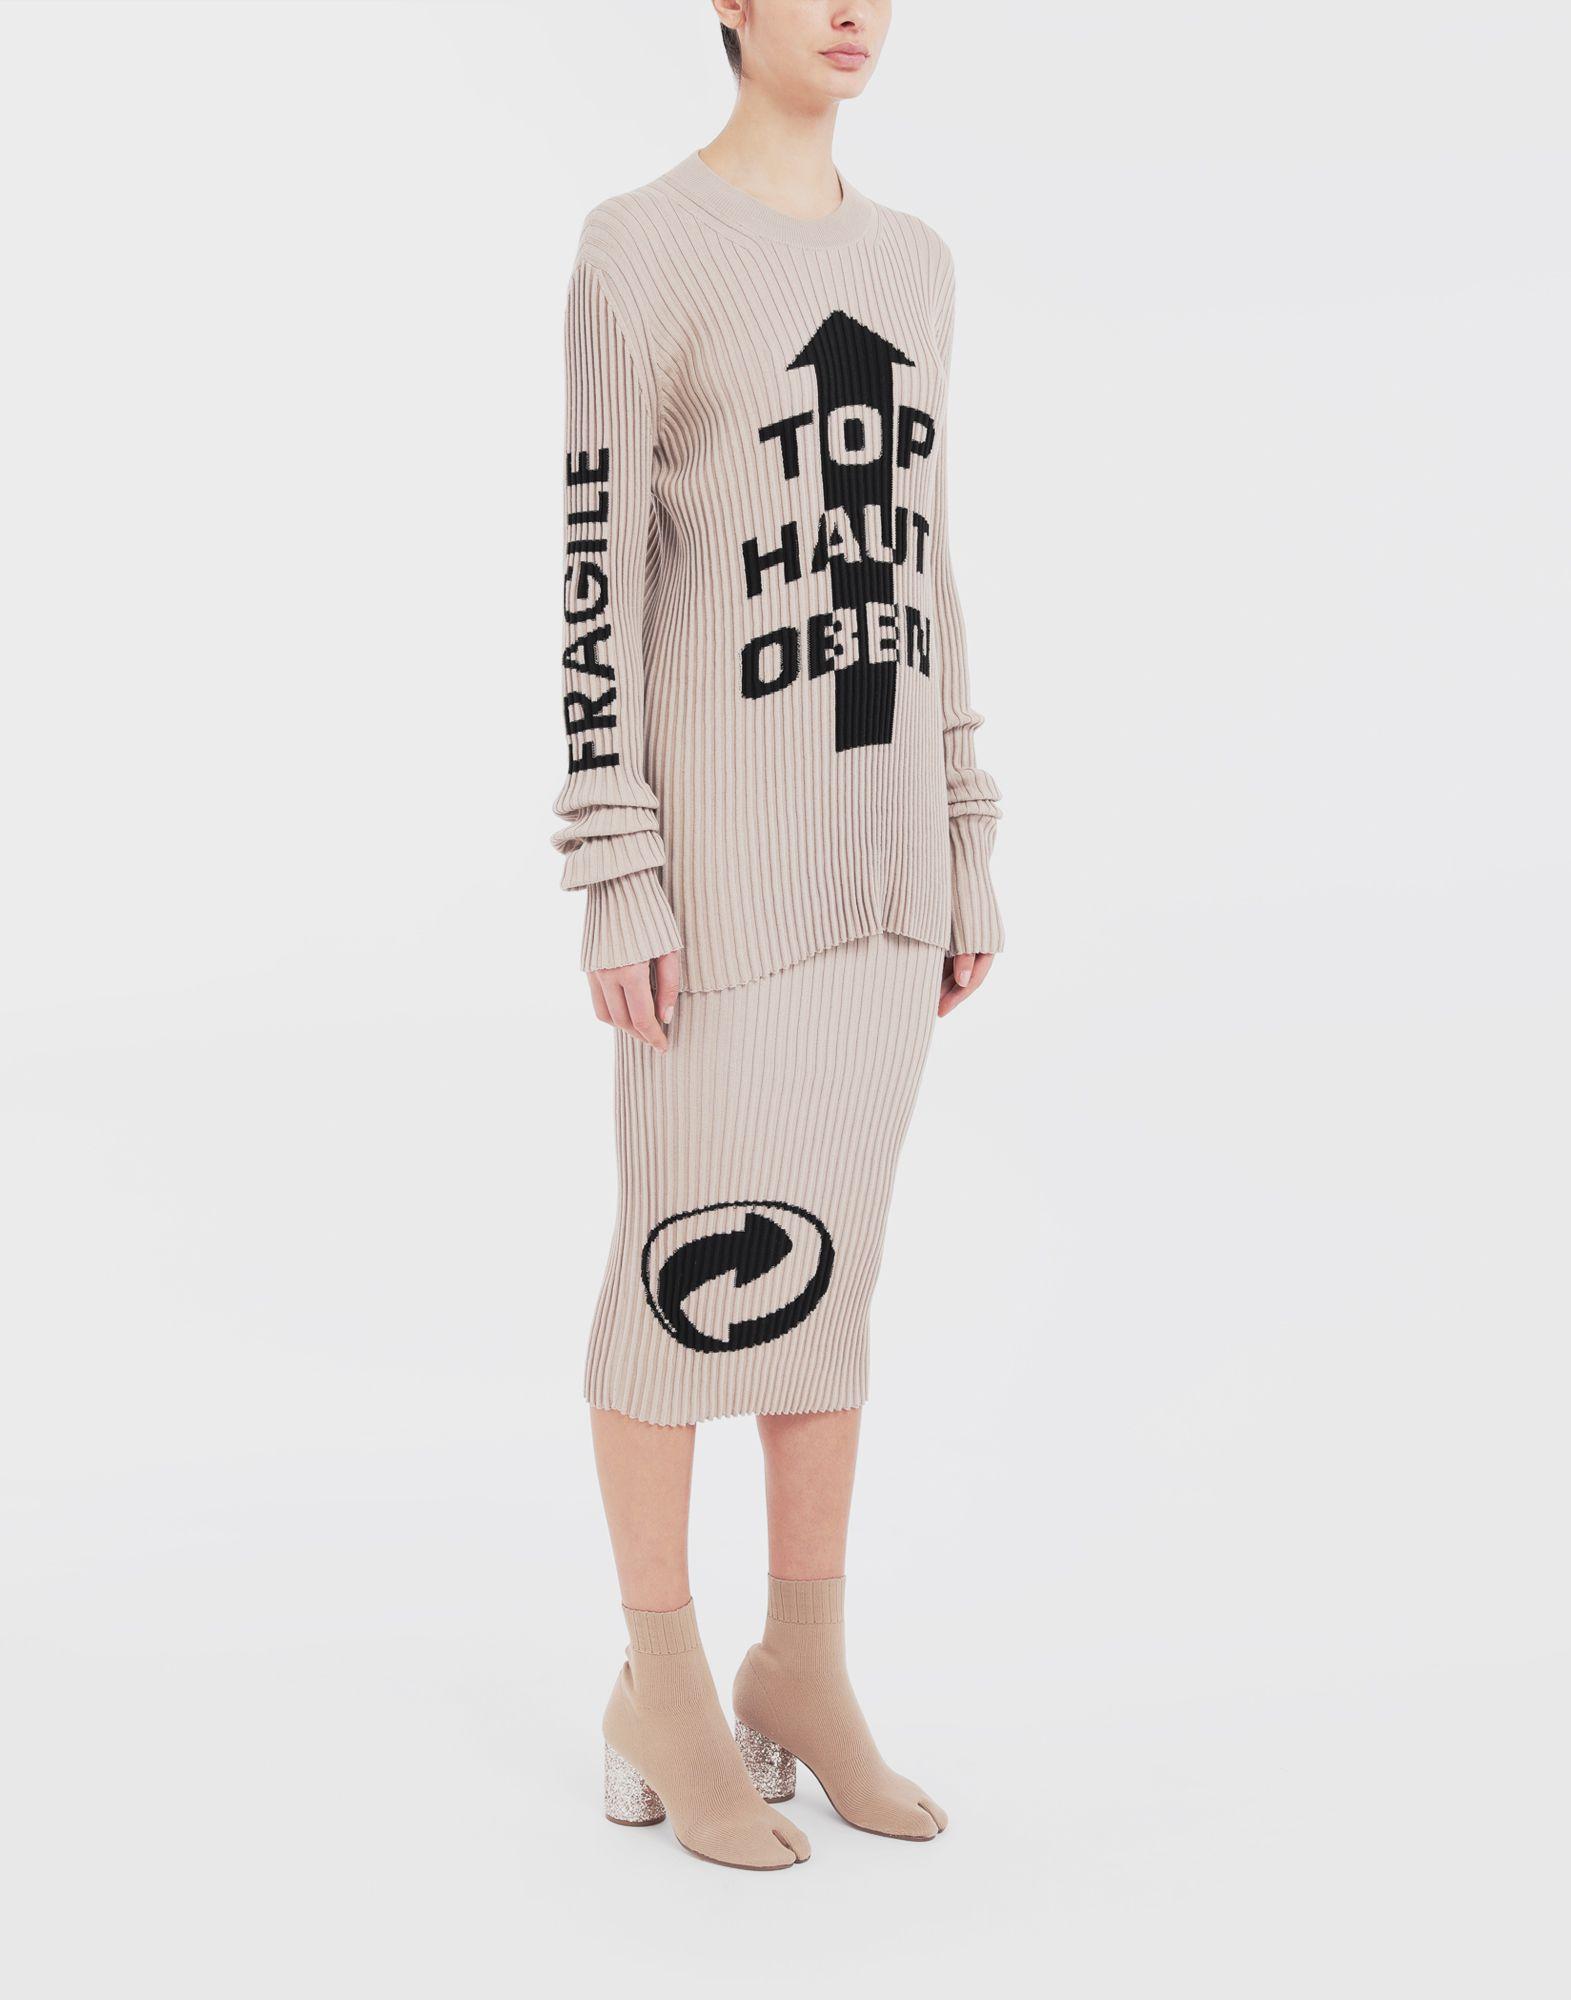 MAISON MARGIELA Ribs jumper in 'Carton' intarsia Long sleeve sweater Woman d